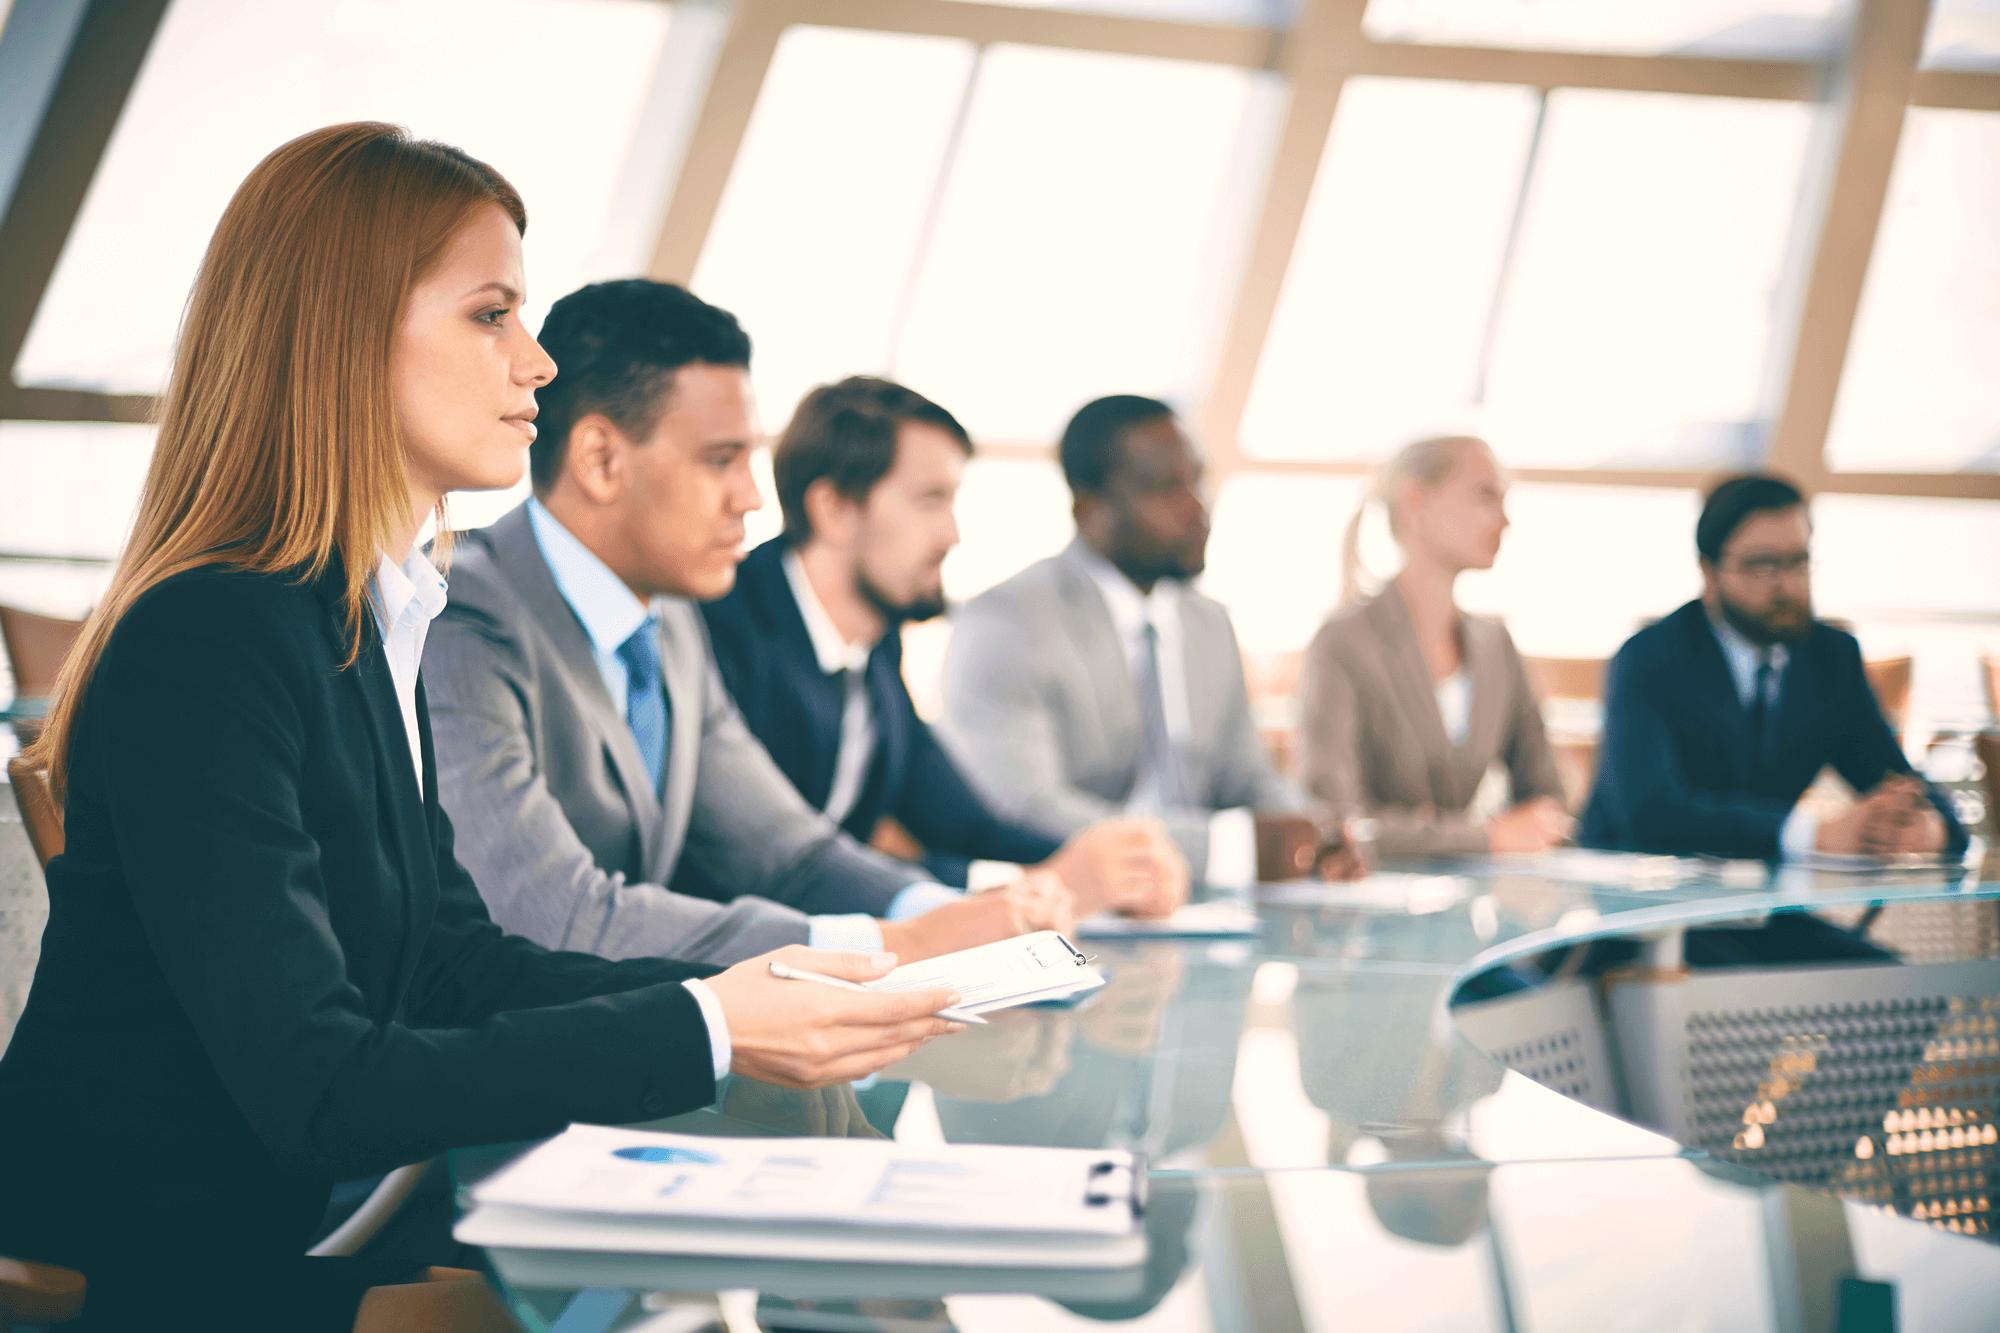 Data Analytics opleiding   10+ Business Analytics opleidingen